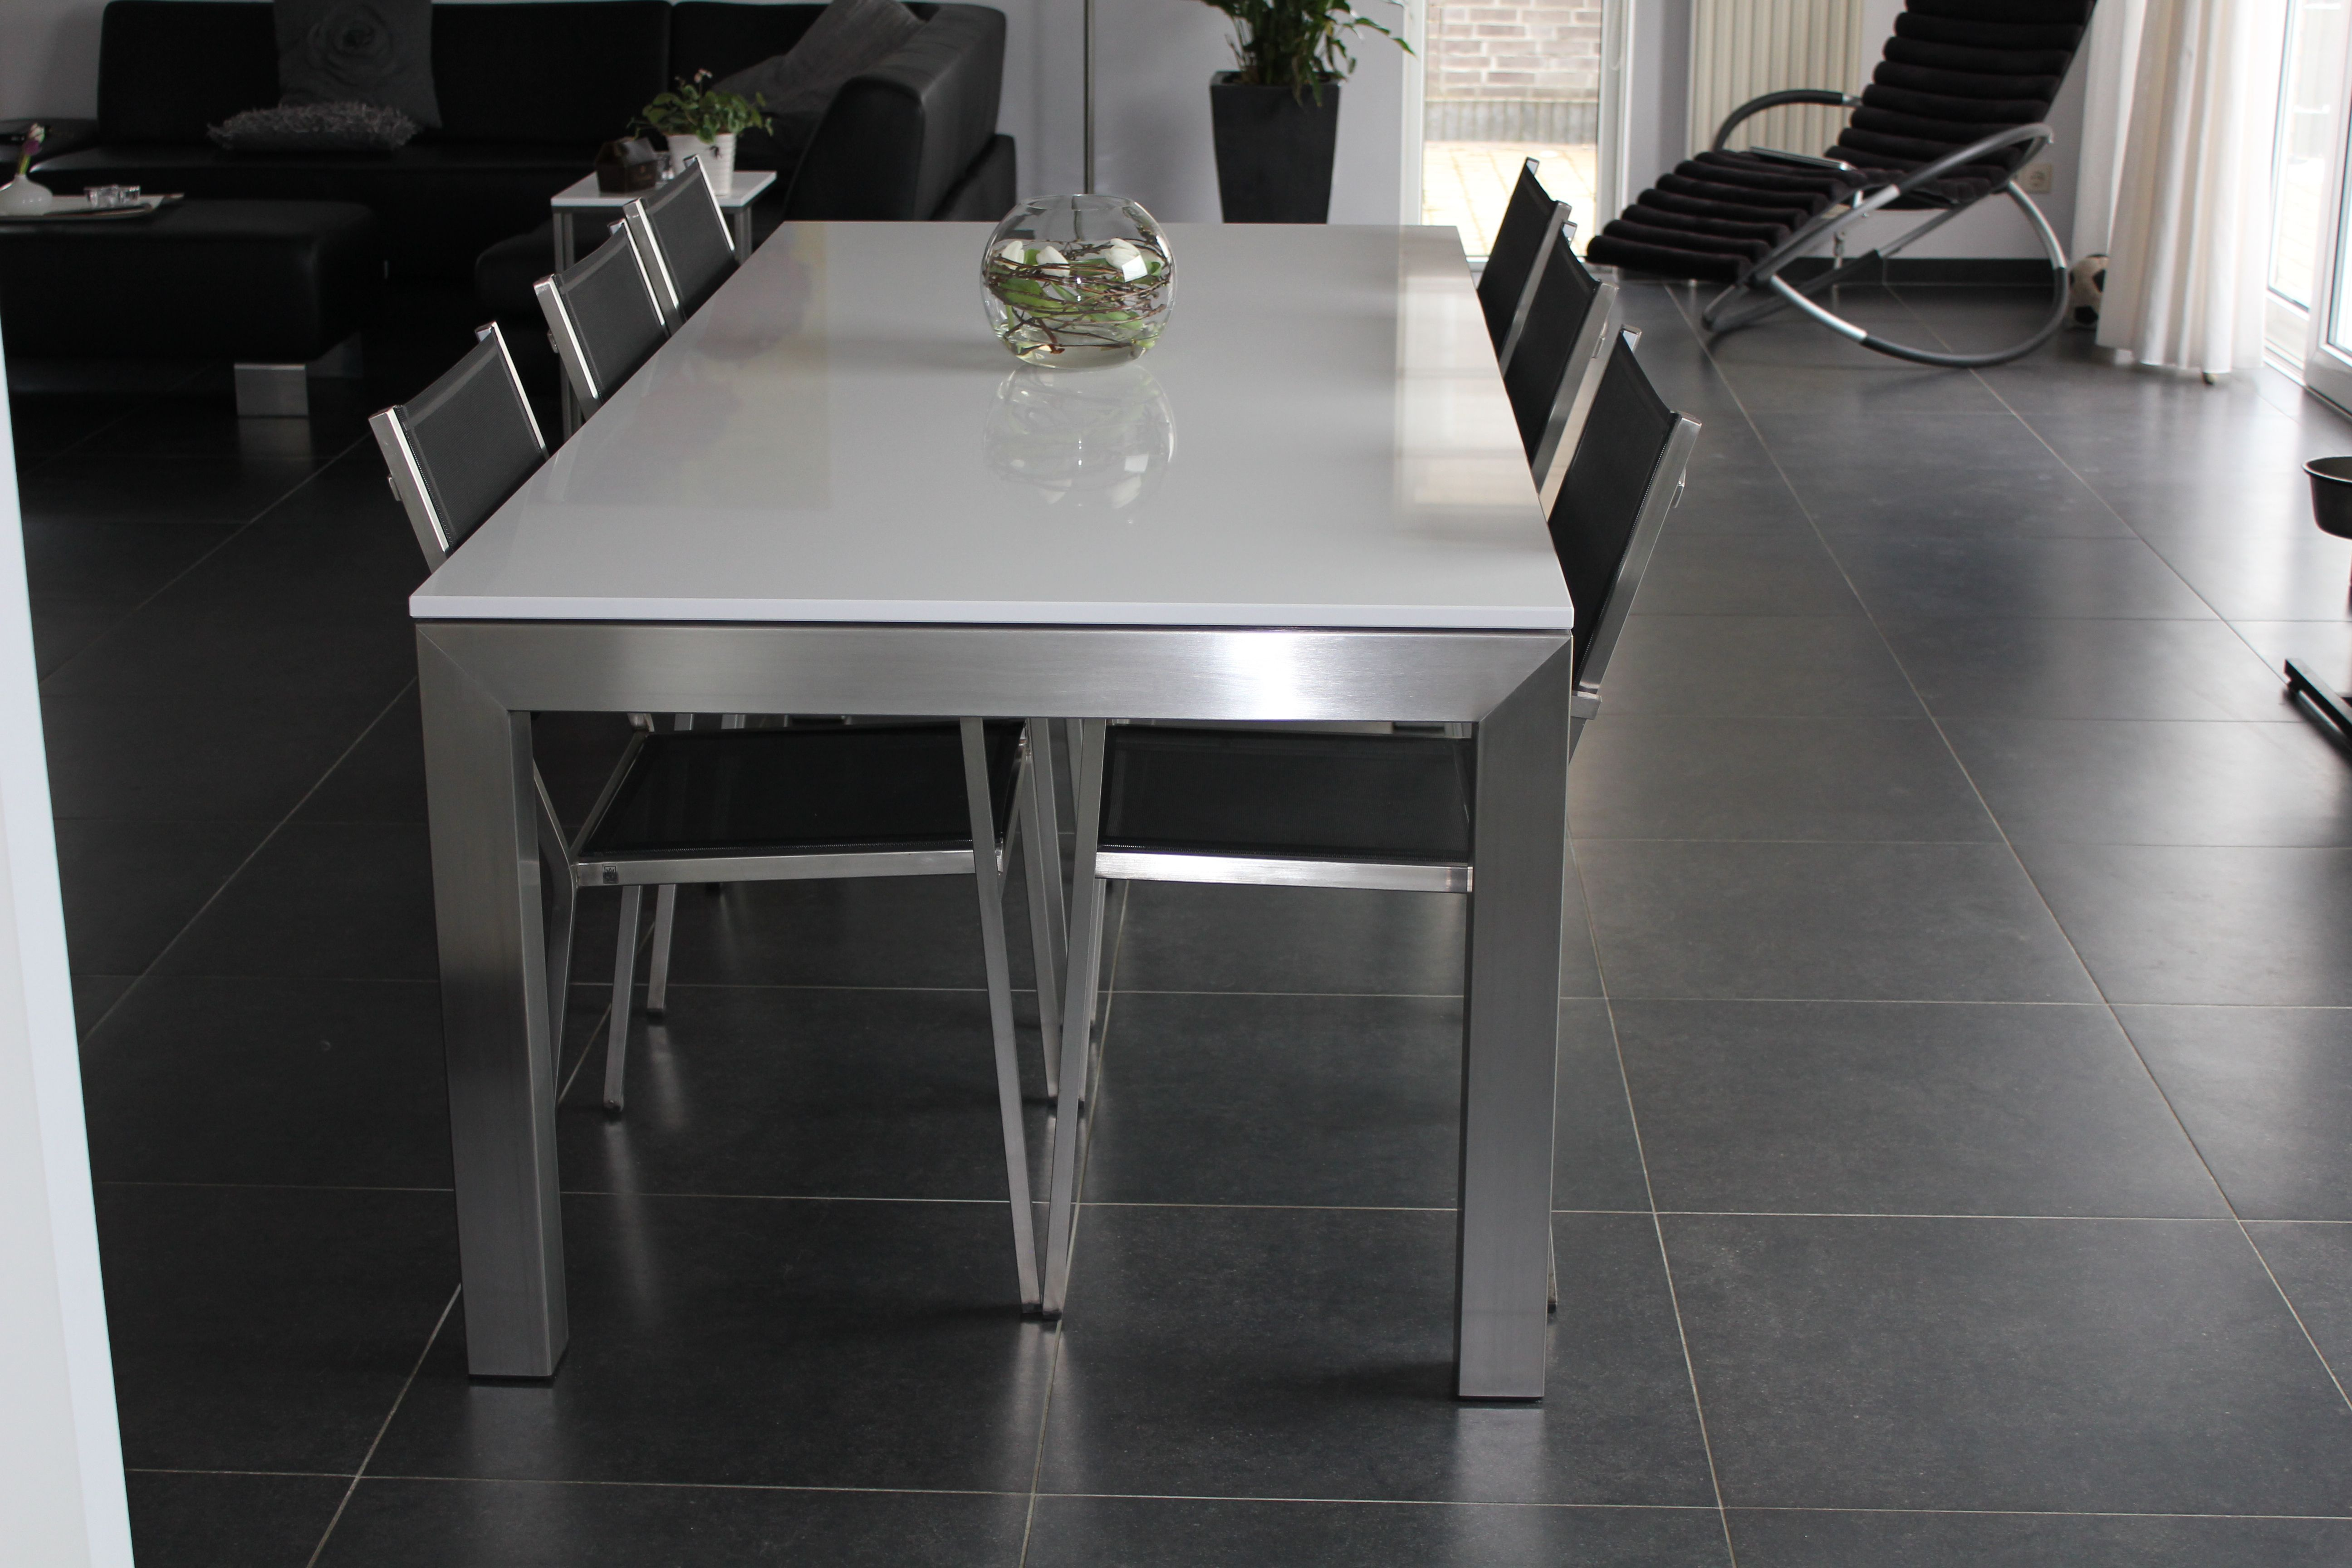 Eettafel Glas Rvs Poten.Moderne Tafel Met Rvs Tafelpoten En Glazen Tafelblad